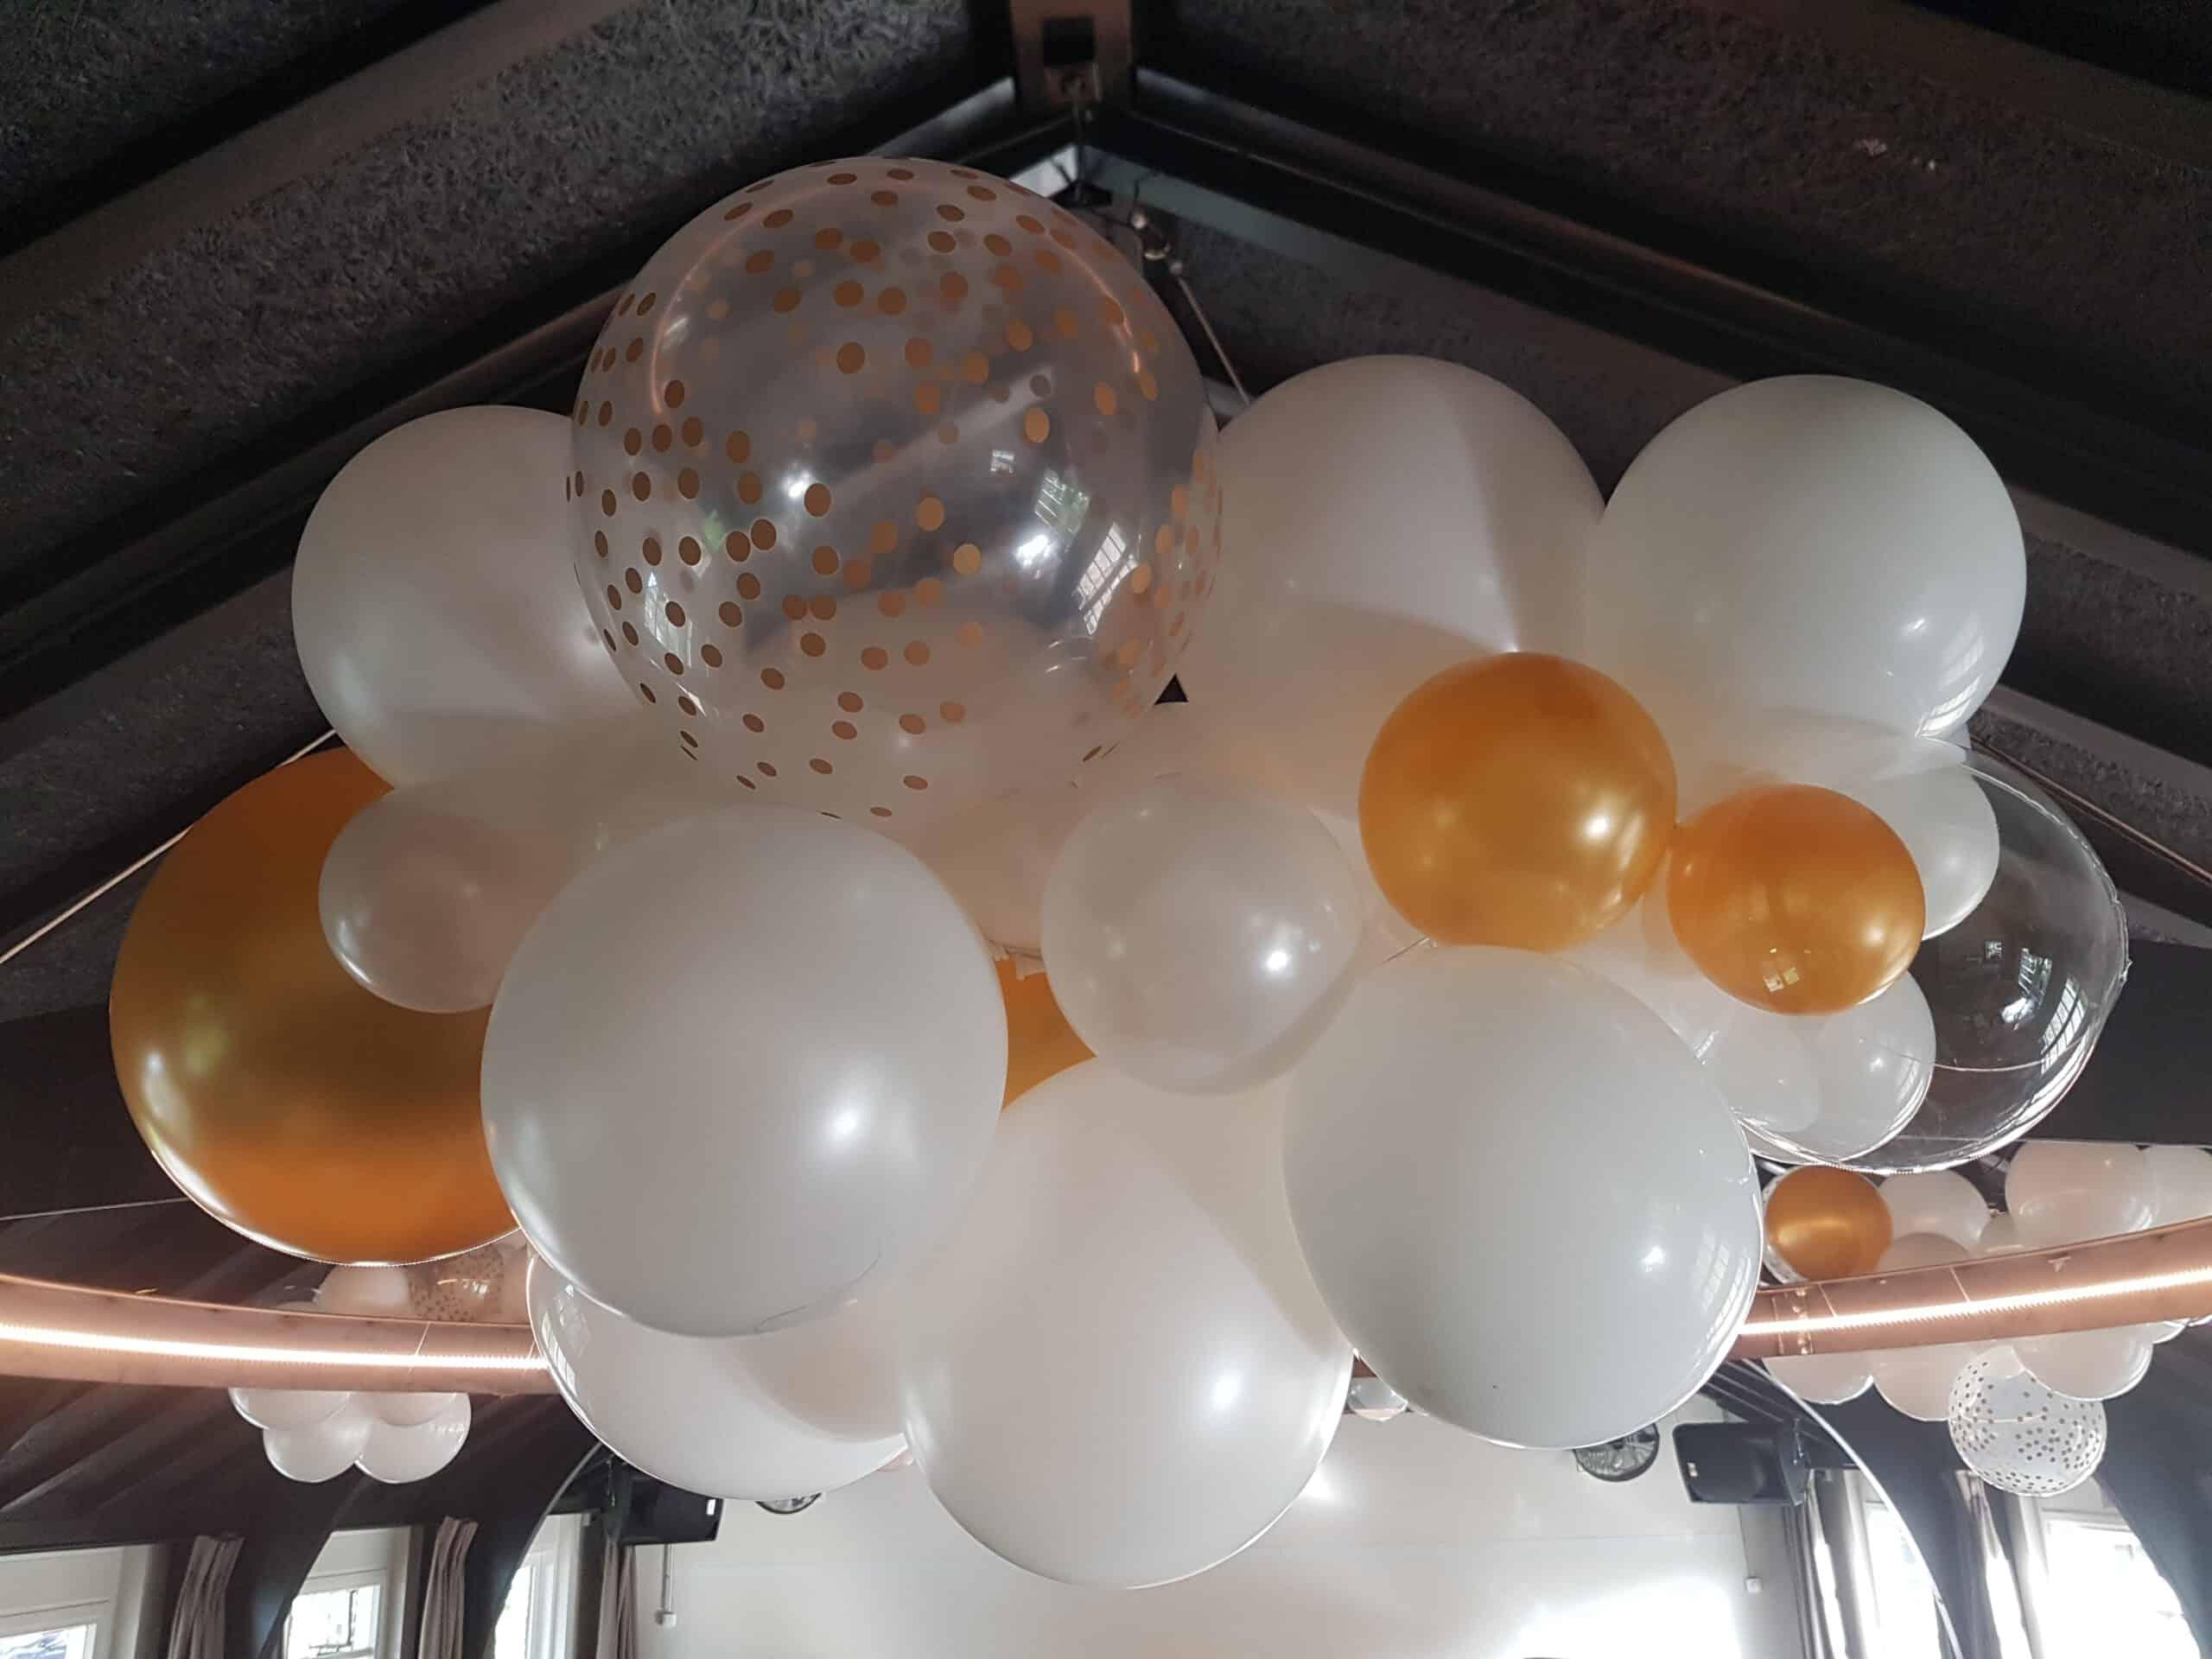 20190927 102118 scaled - Organic ballondecoratie van allerlei maten ballonnen